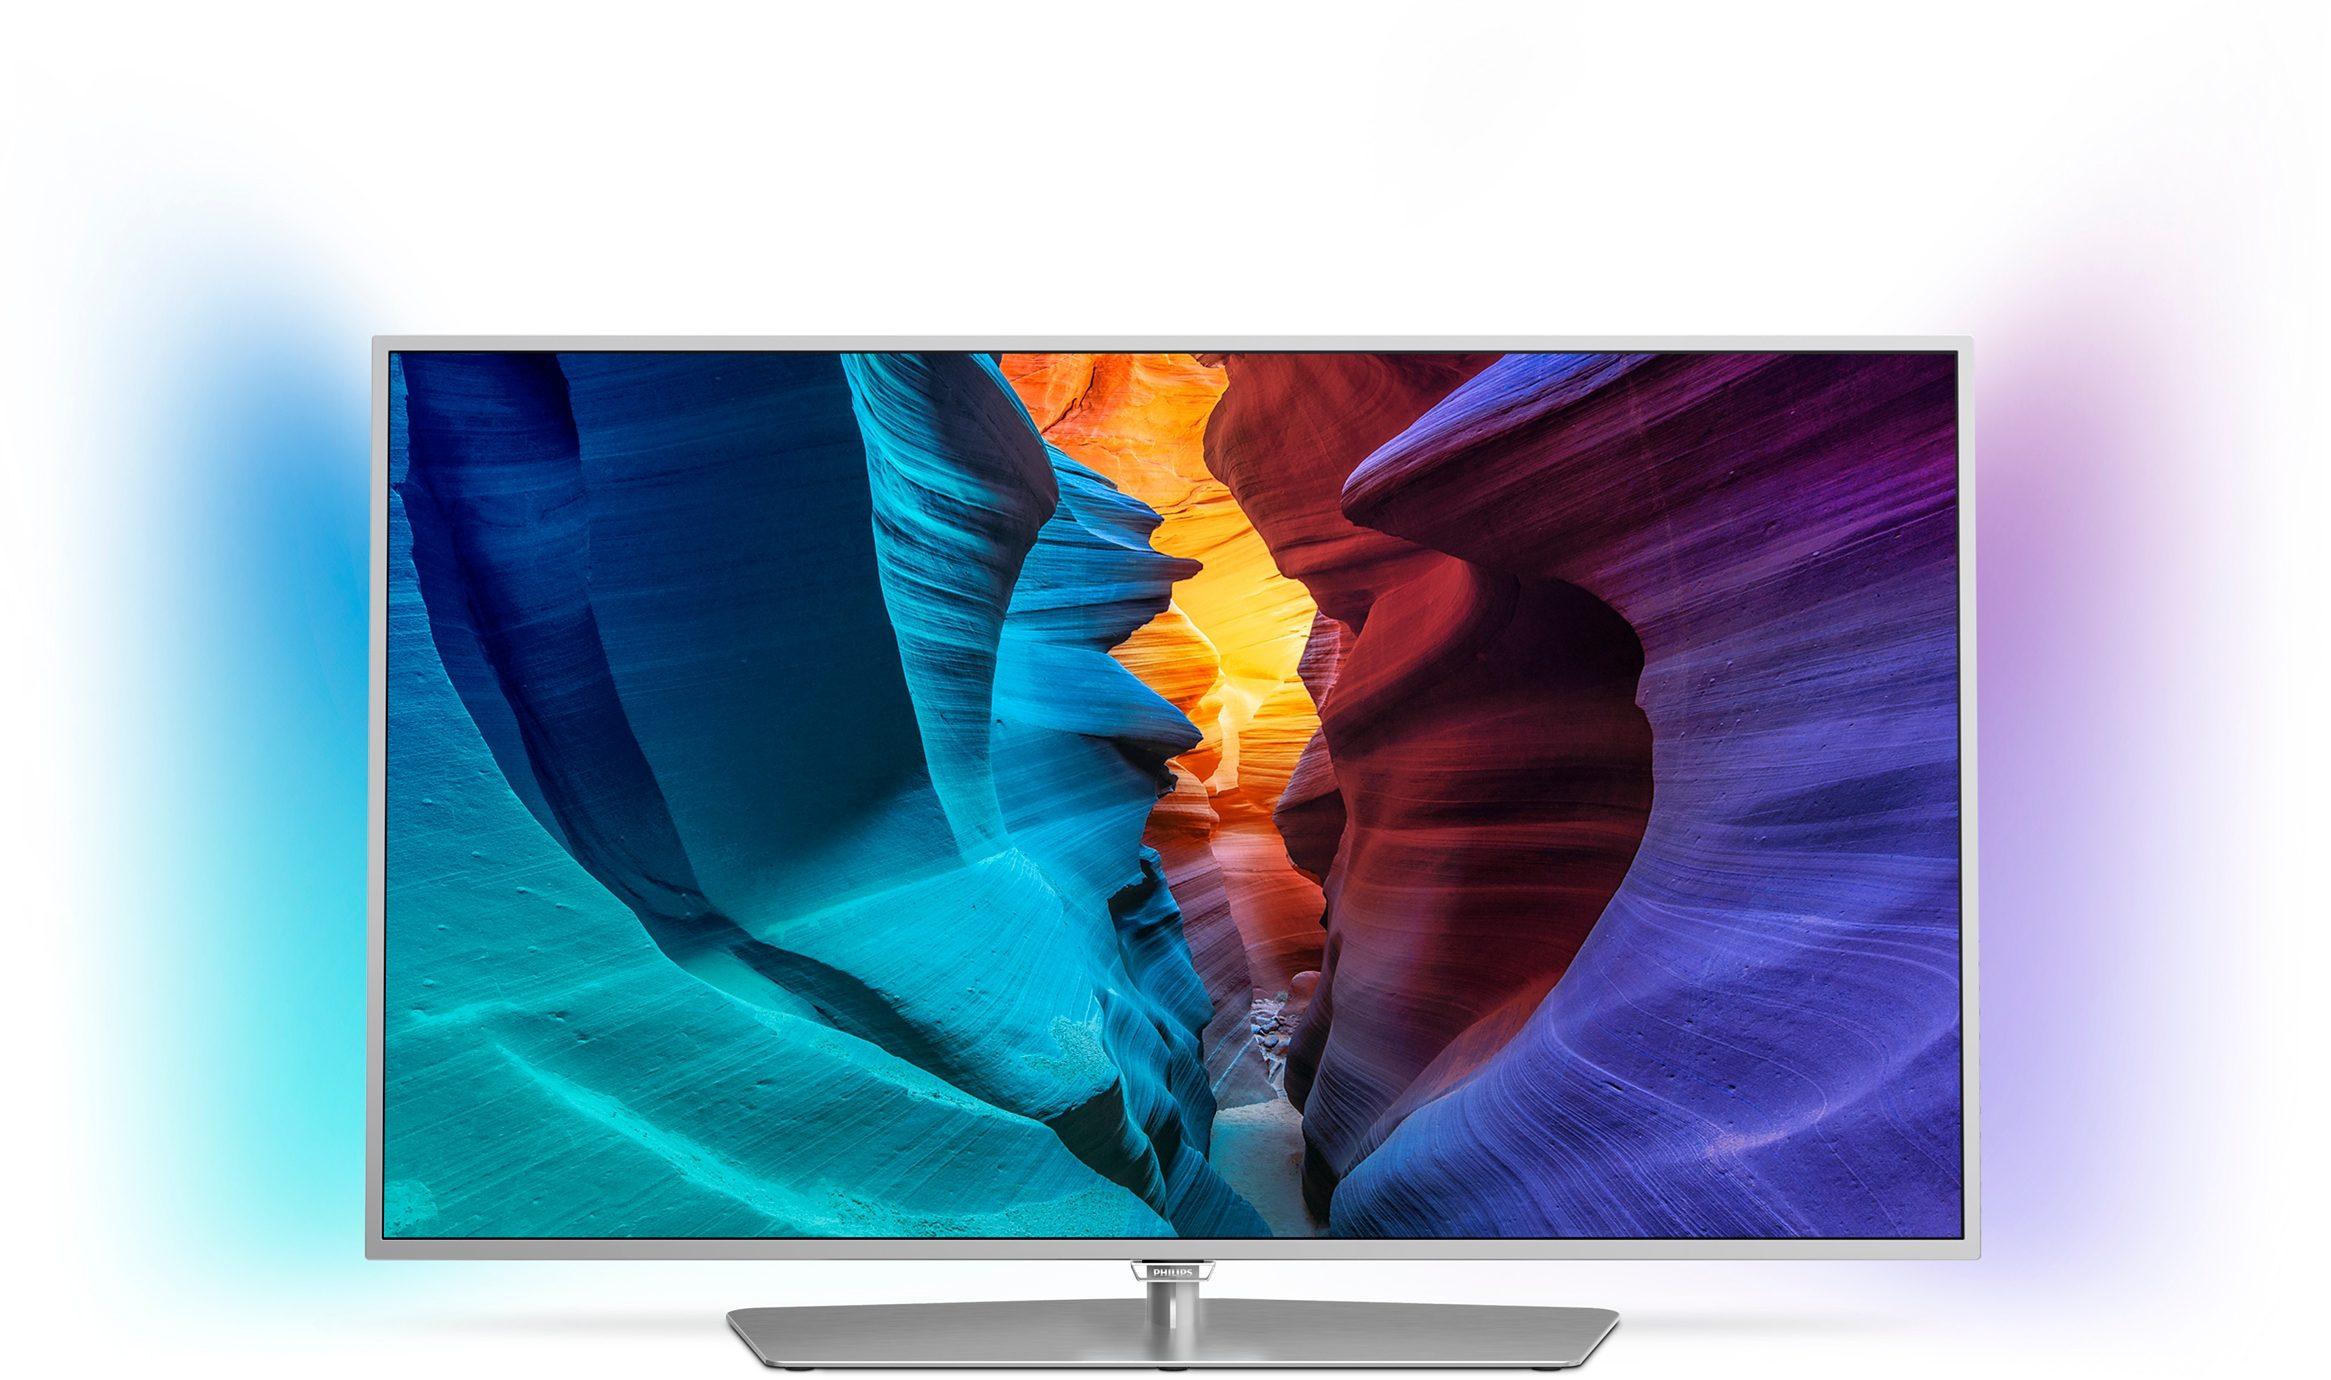 Philips 55PFK6540, LED Fernseher, 139 cm (55 Zoll), 1080p (Full HD) Ambilight, Smart-TV